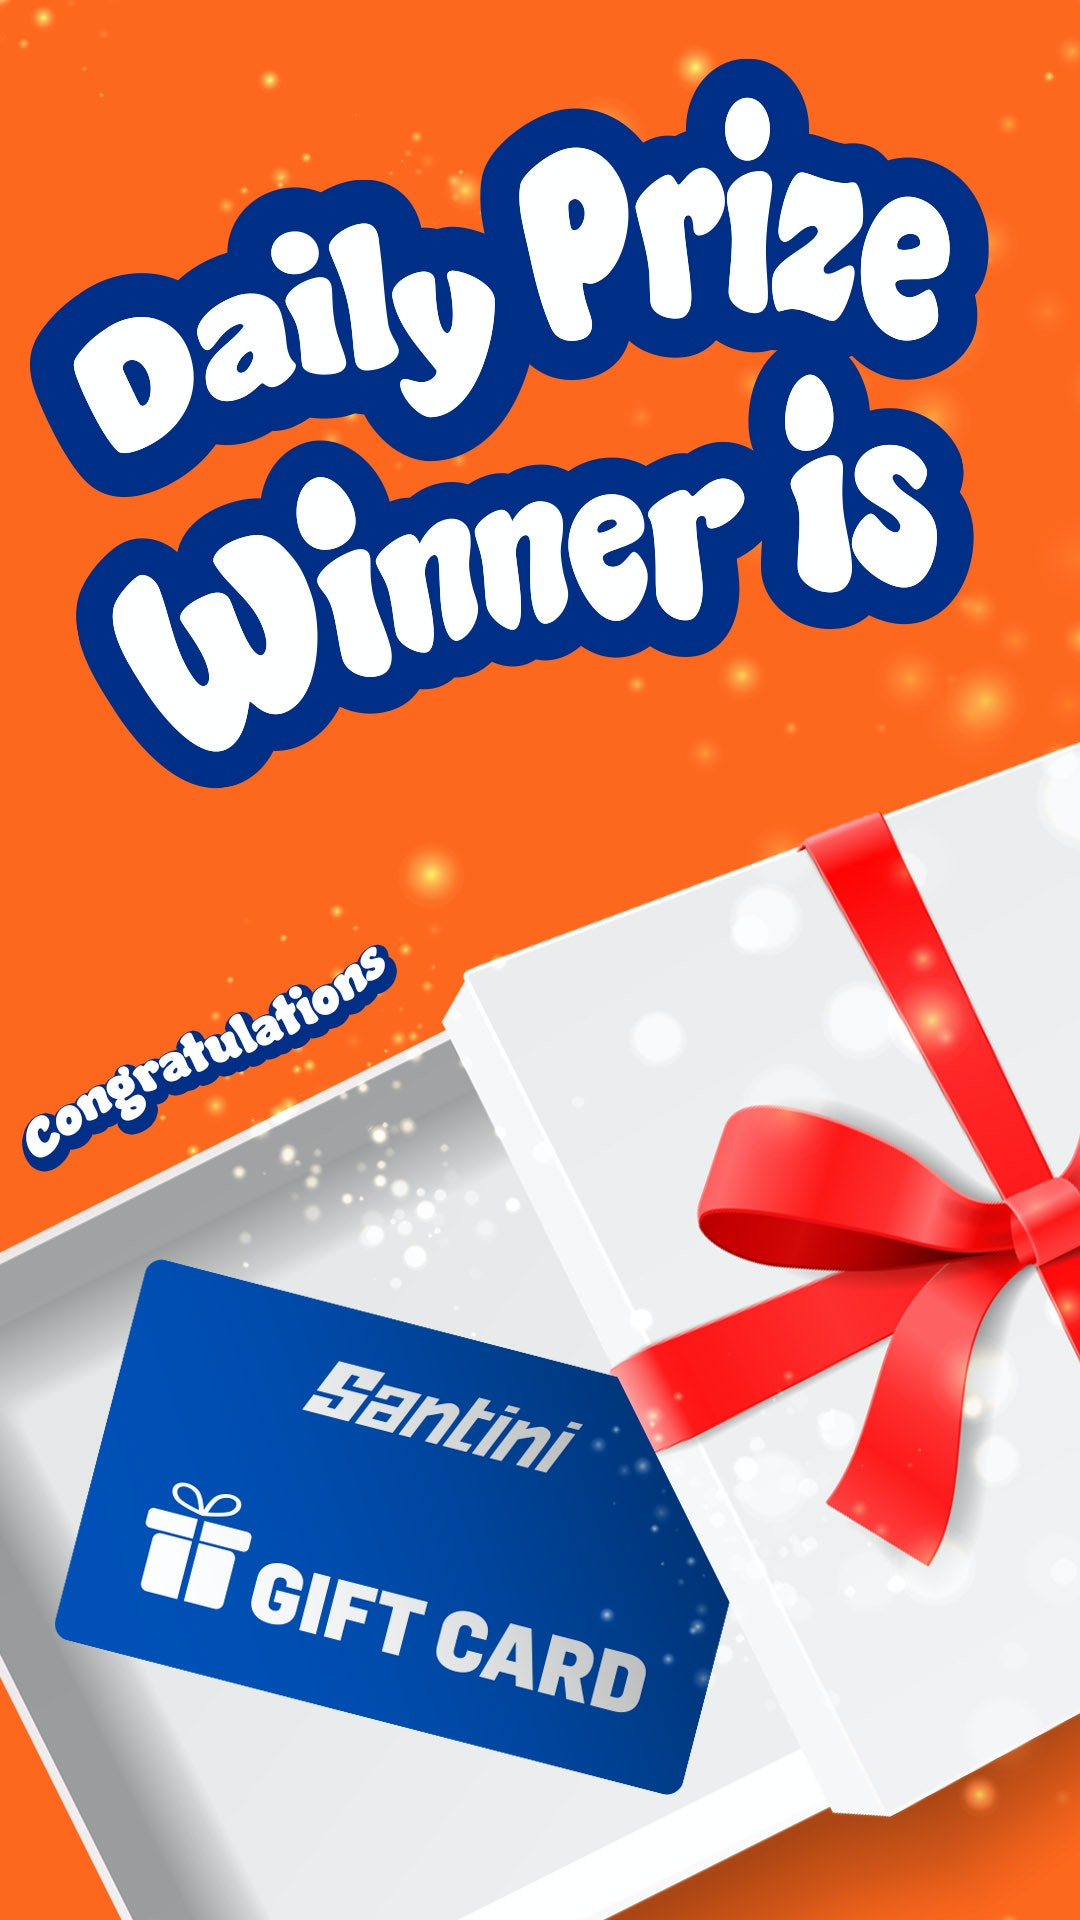 Santini Gift Card